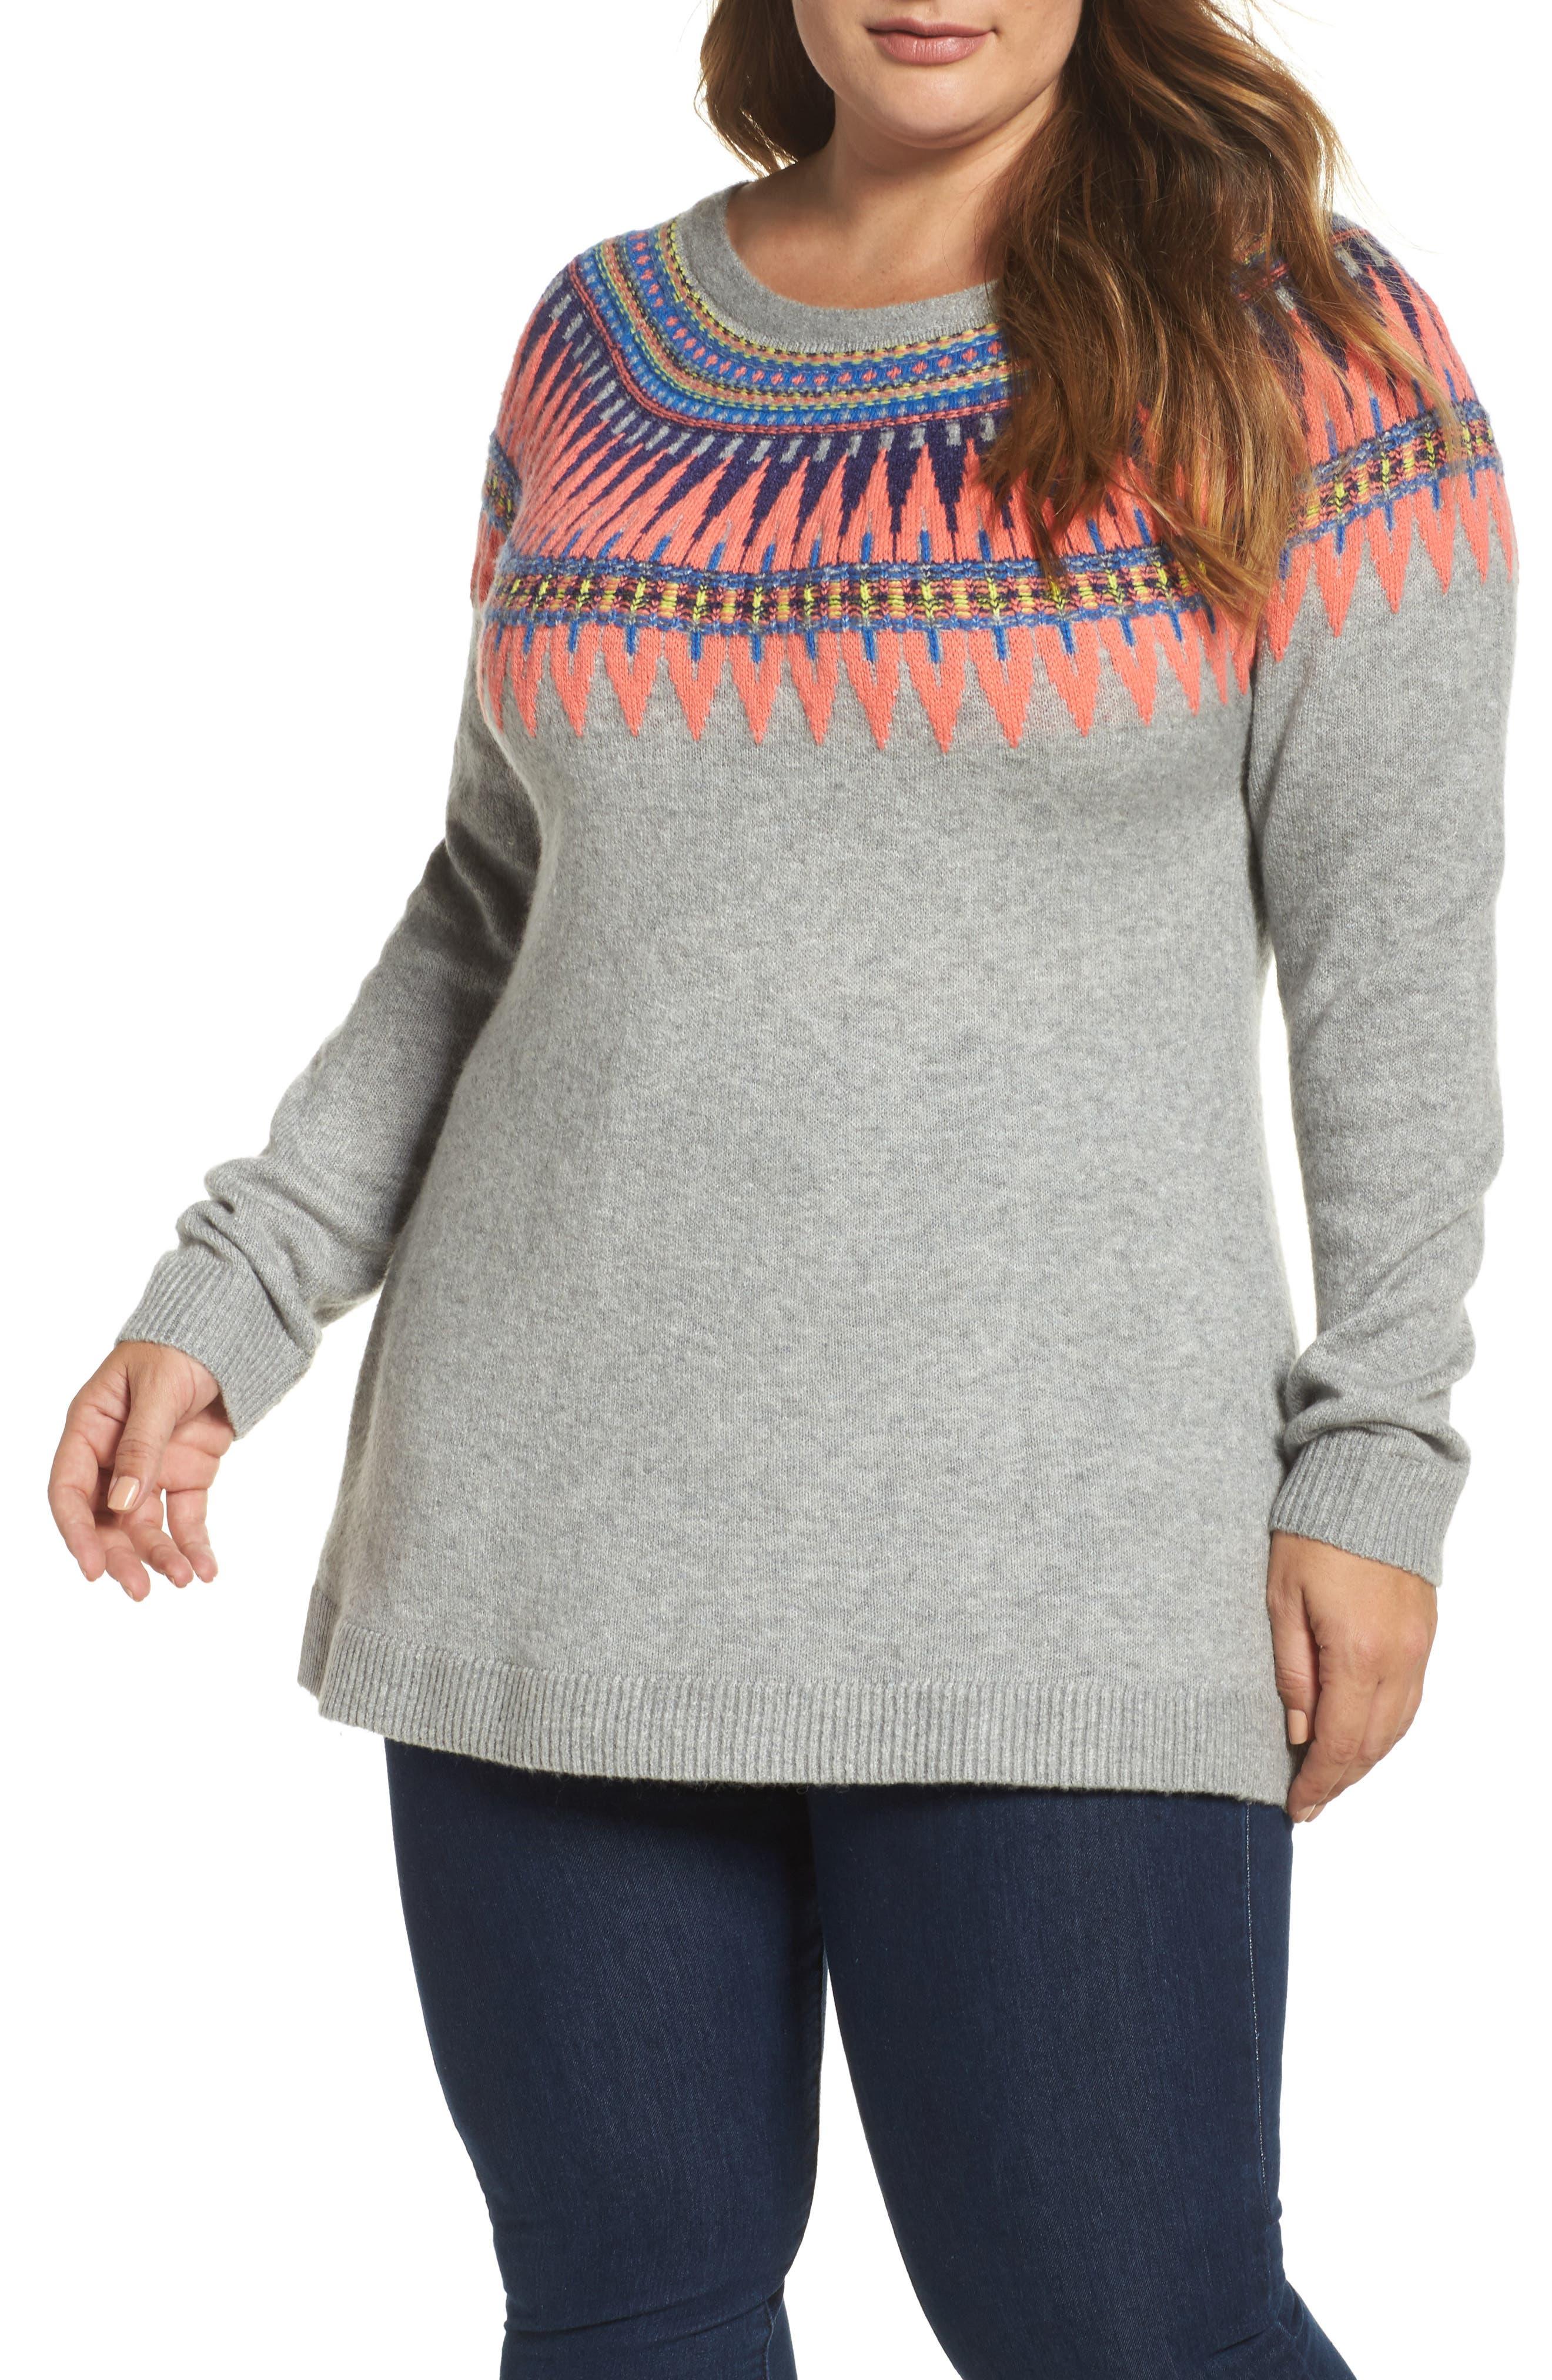 Main Image - Caslon® Tie Back Patterned Sweater (Plus Size)